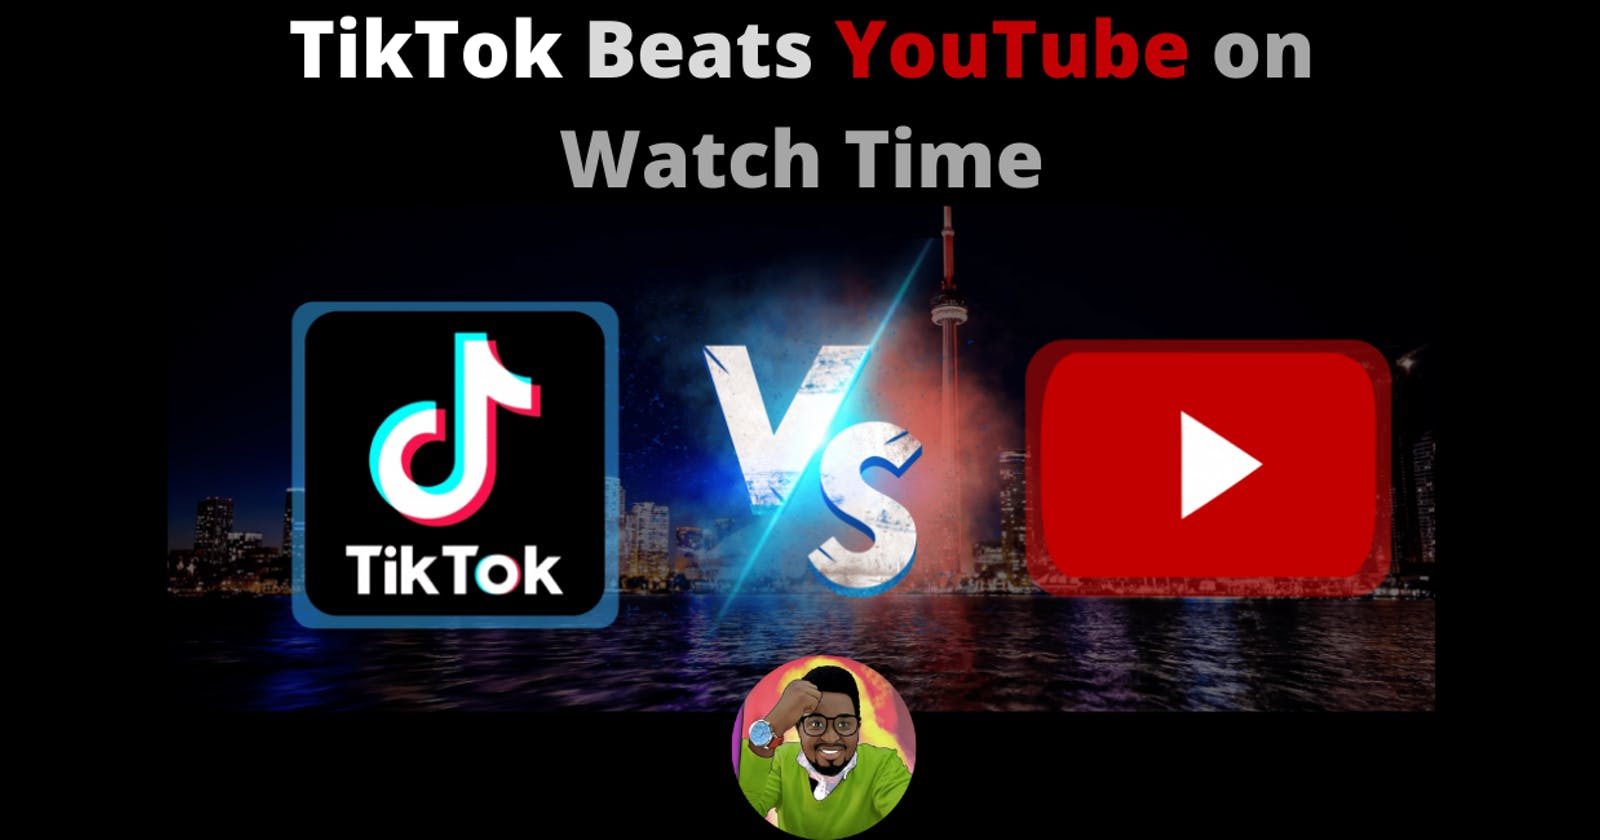 TikTok Beats YouTube on Watch Time